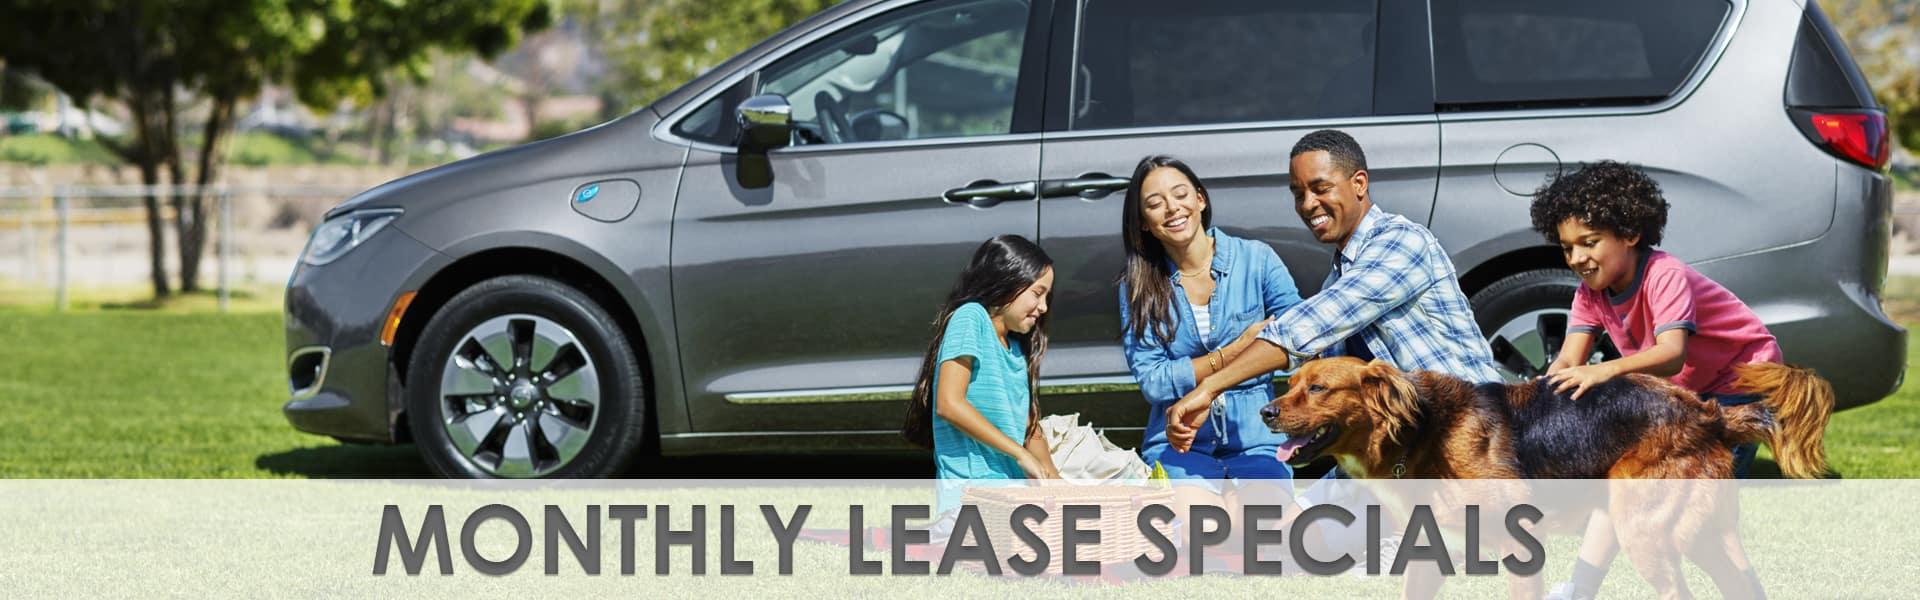 Juneks Lease Specials